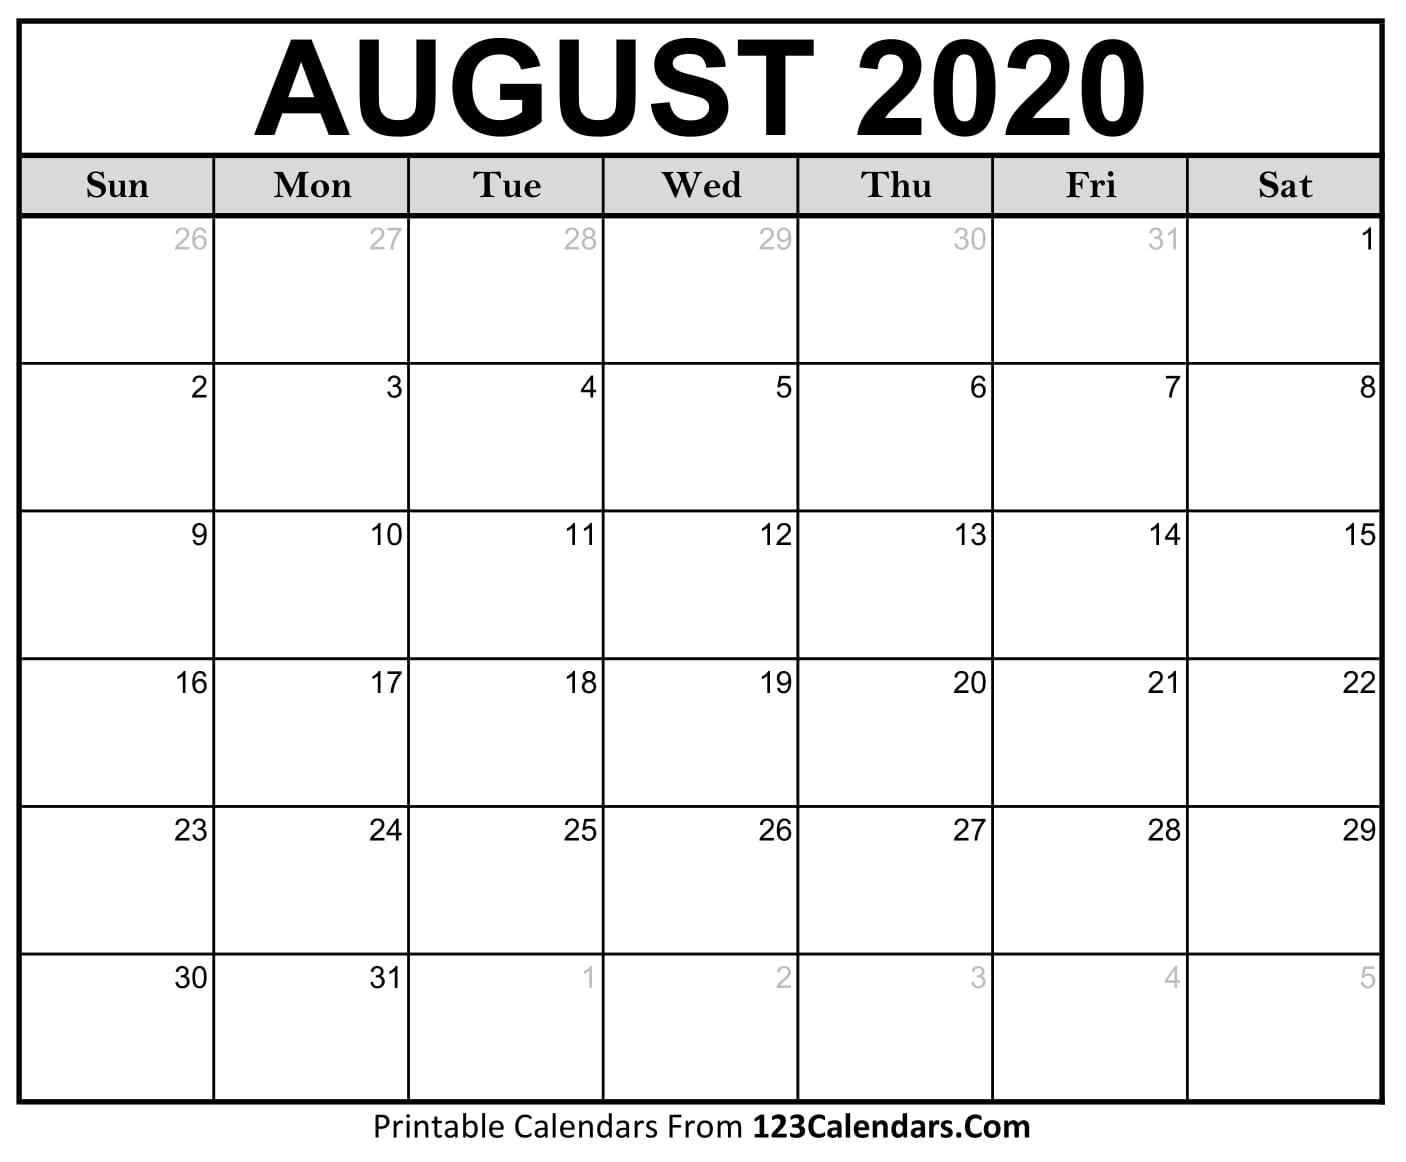 August 2020 Printable Calendar | 123Calendars throughout August 2020 Calendar Printable